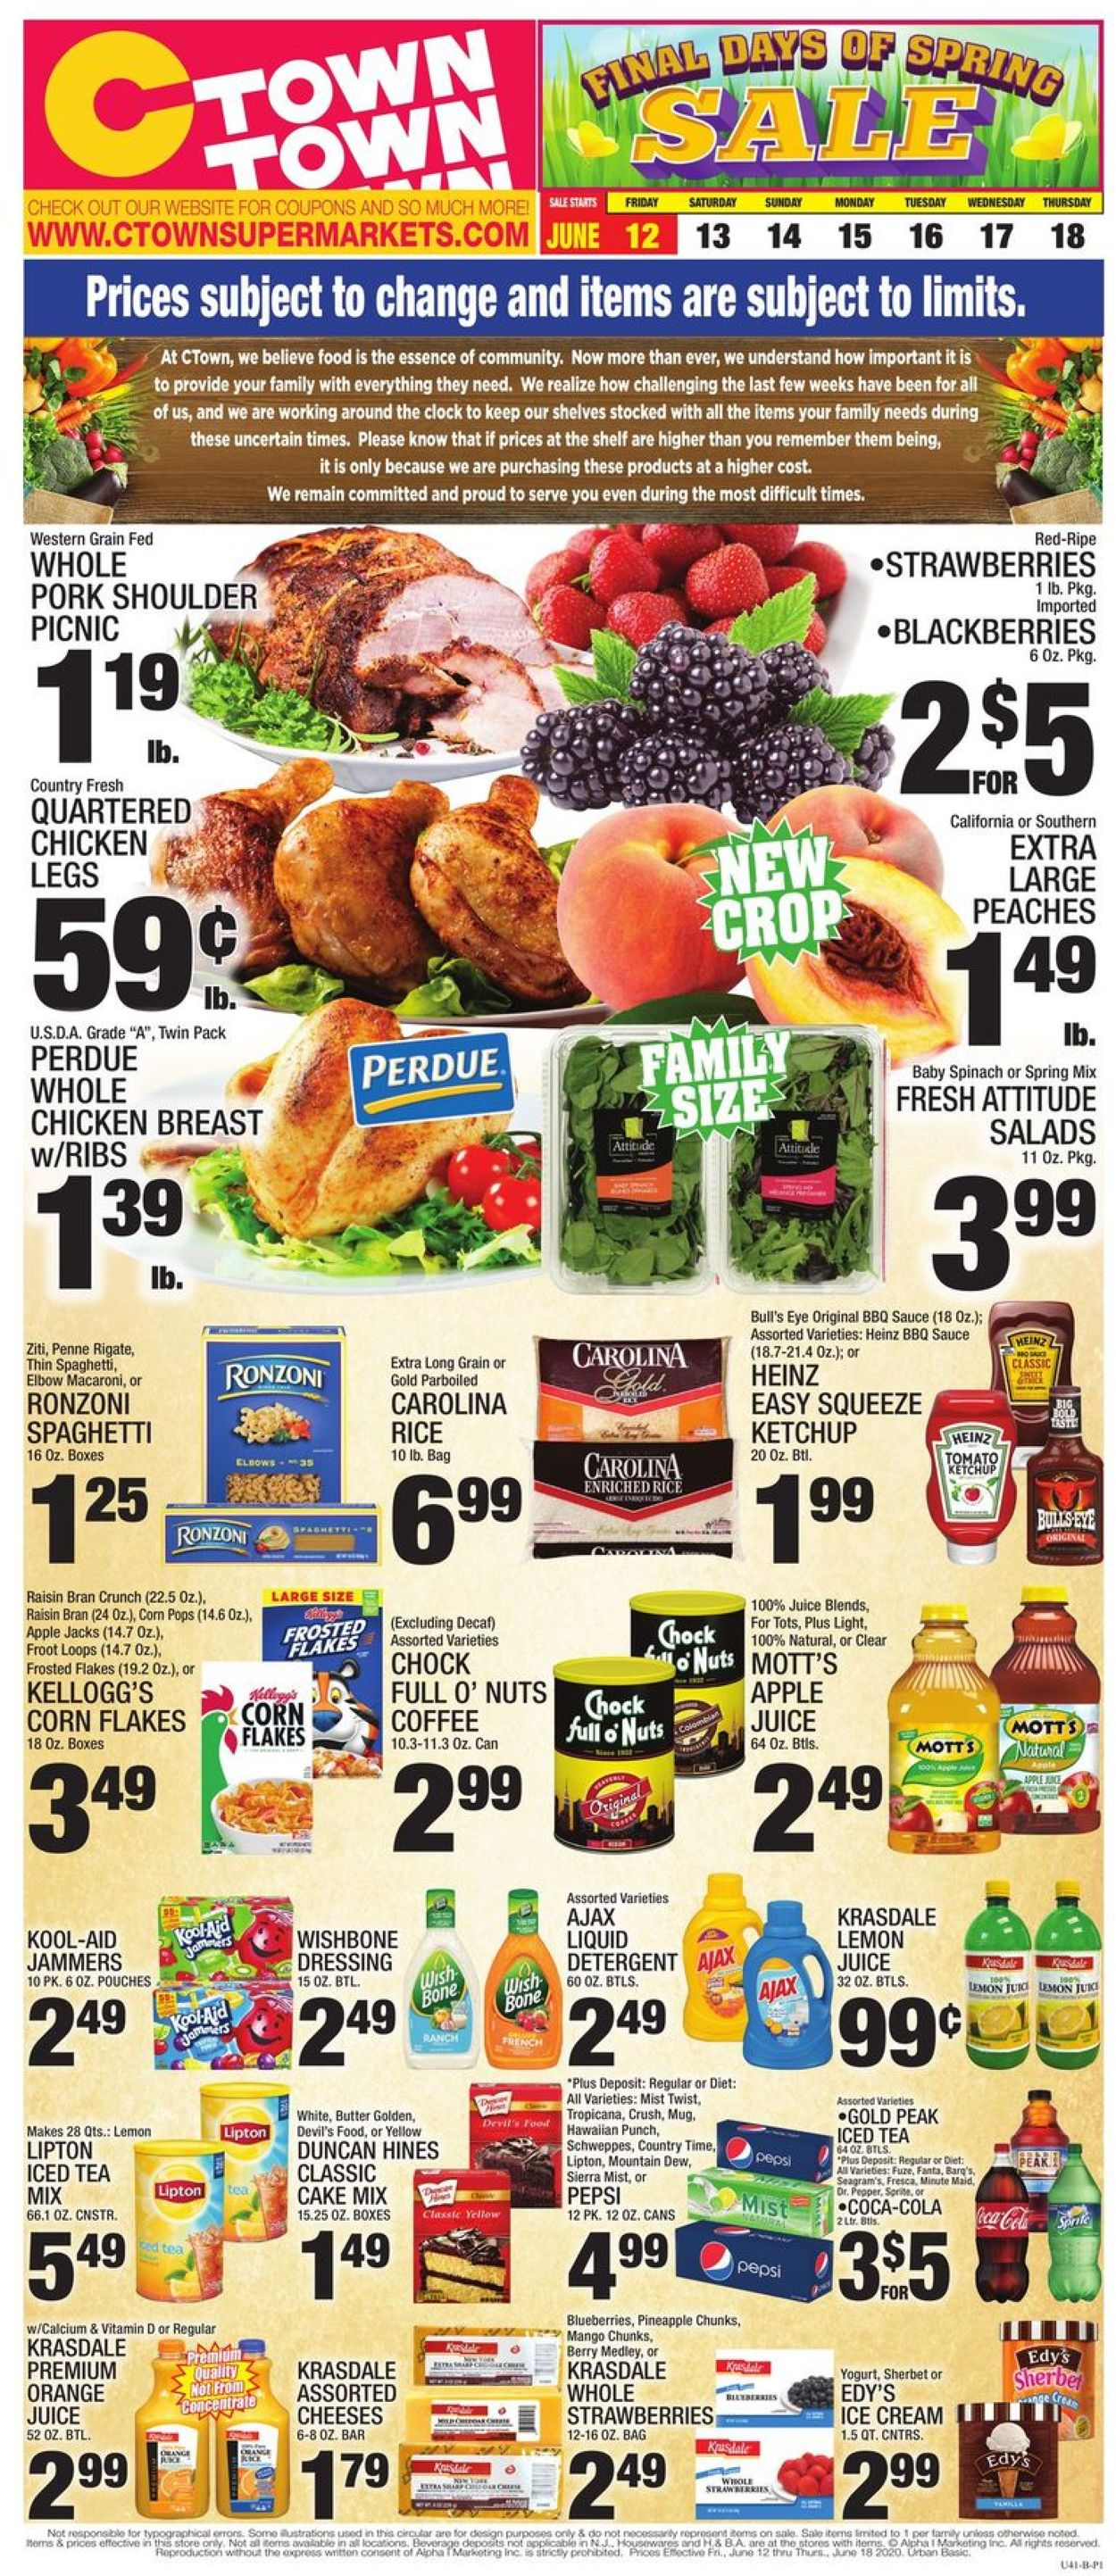 C-Town Weekly Ad Circular - valid 06/12-06/18/2020